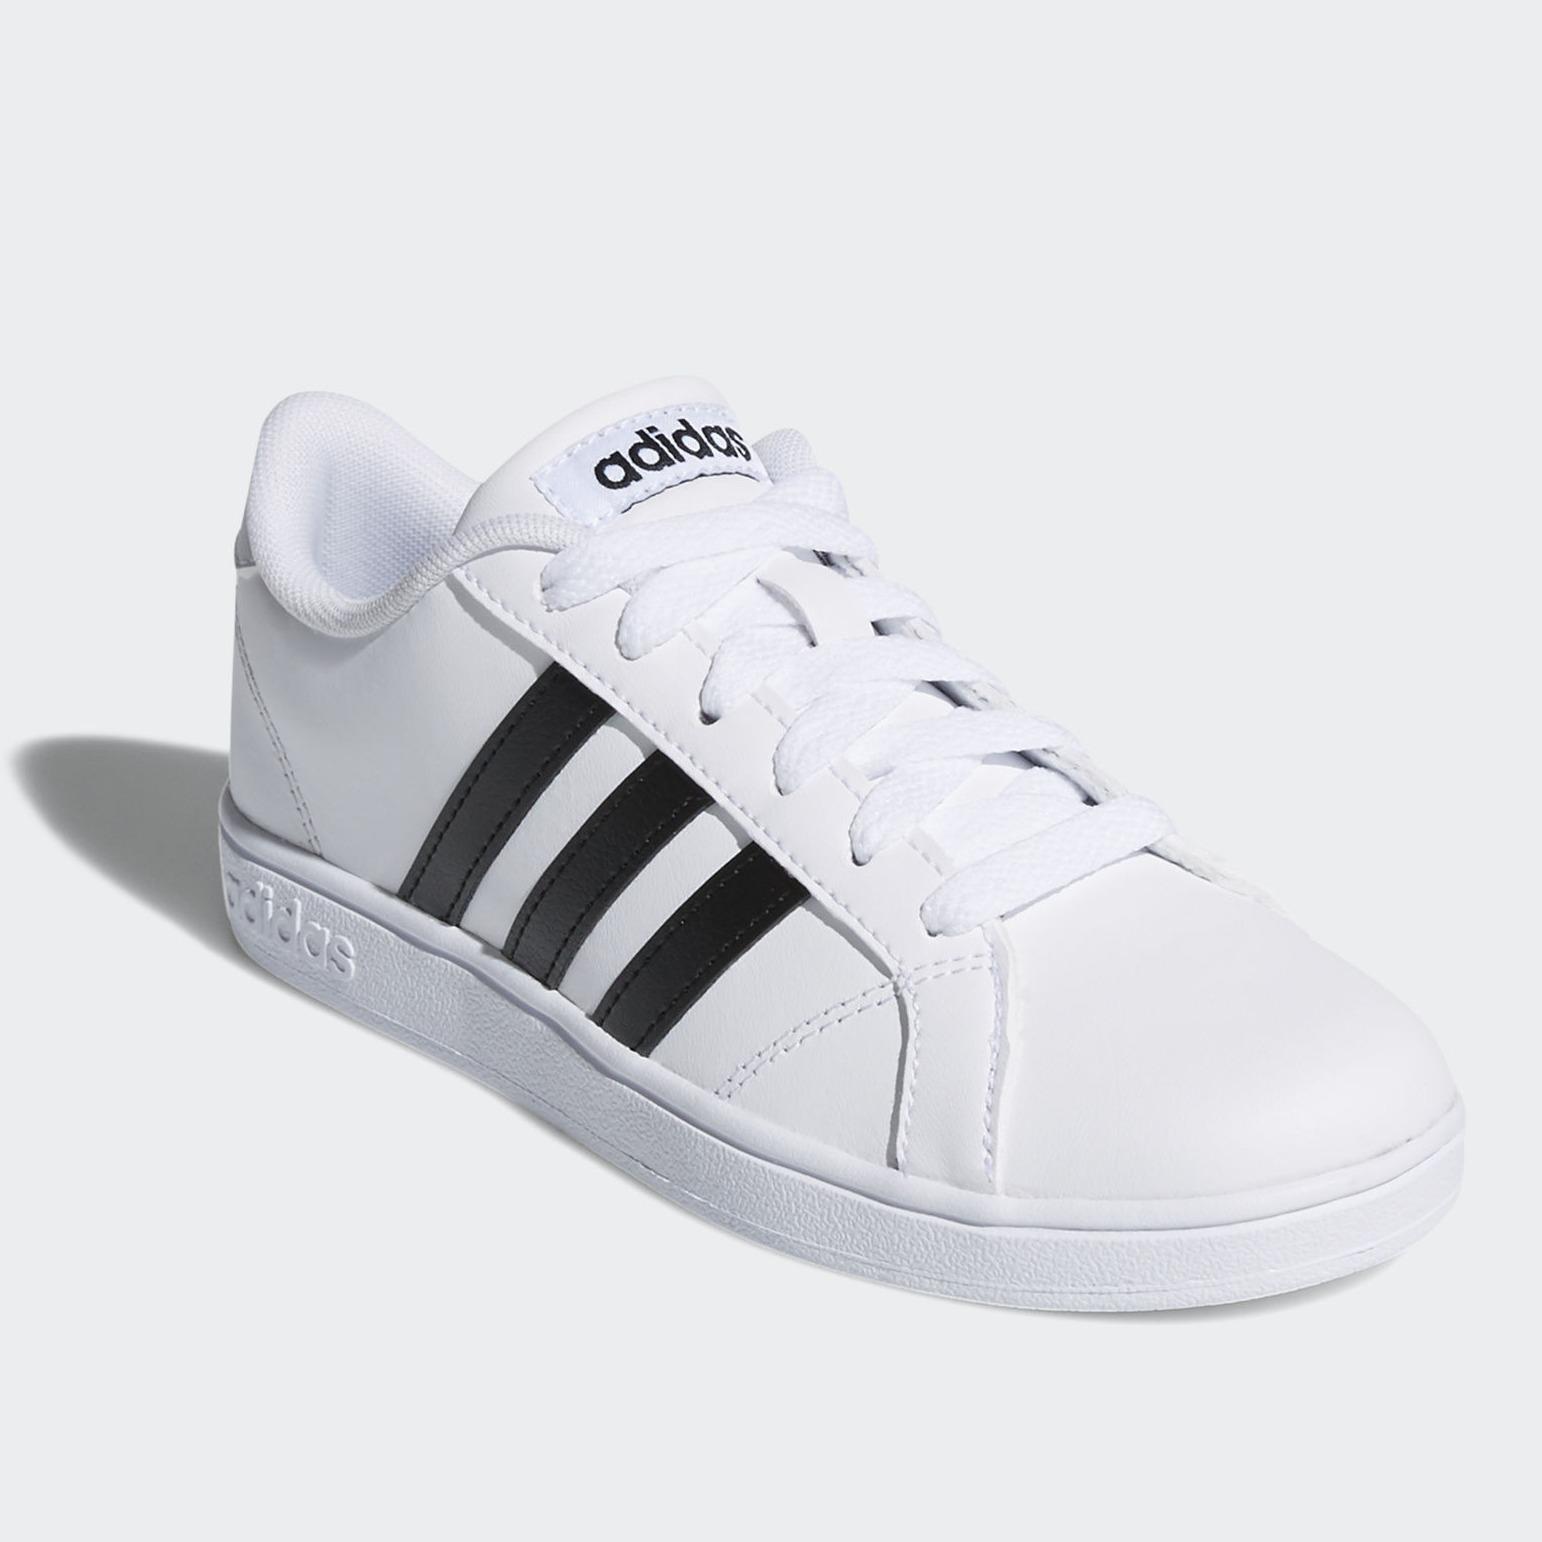 e3d1fad8160 https   www.dealmoon.com Up-to-30-Off-Select-Designer-Bags ...